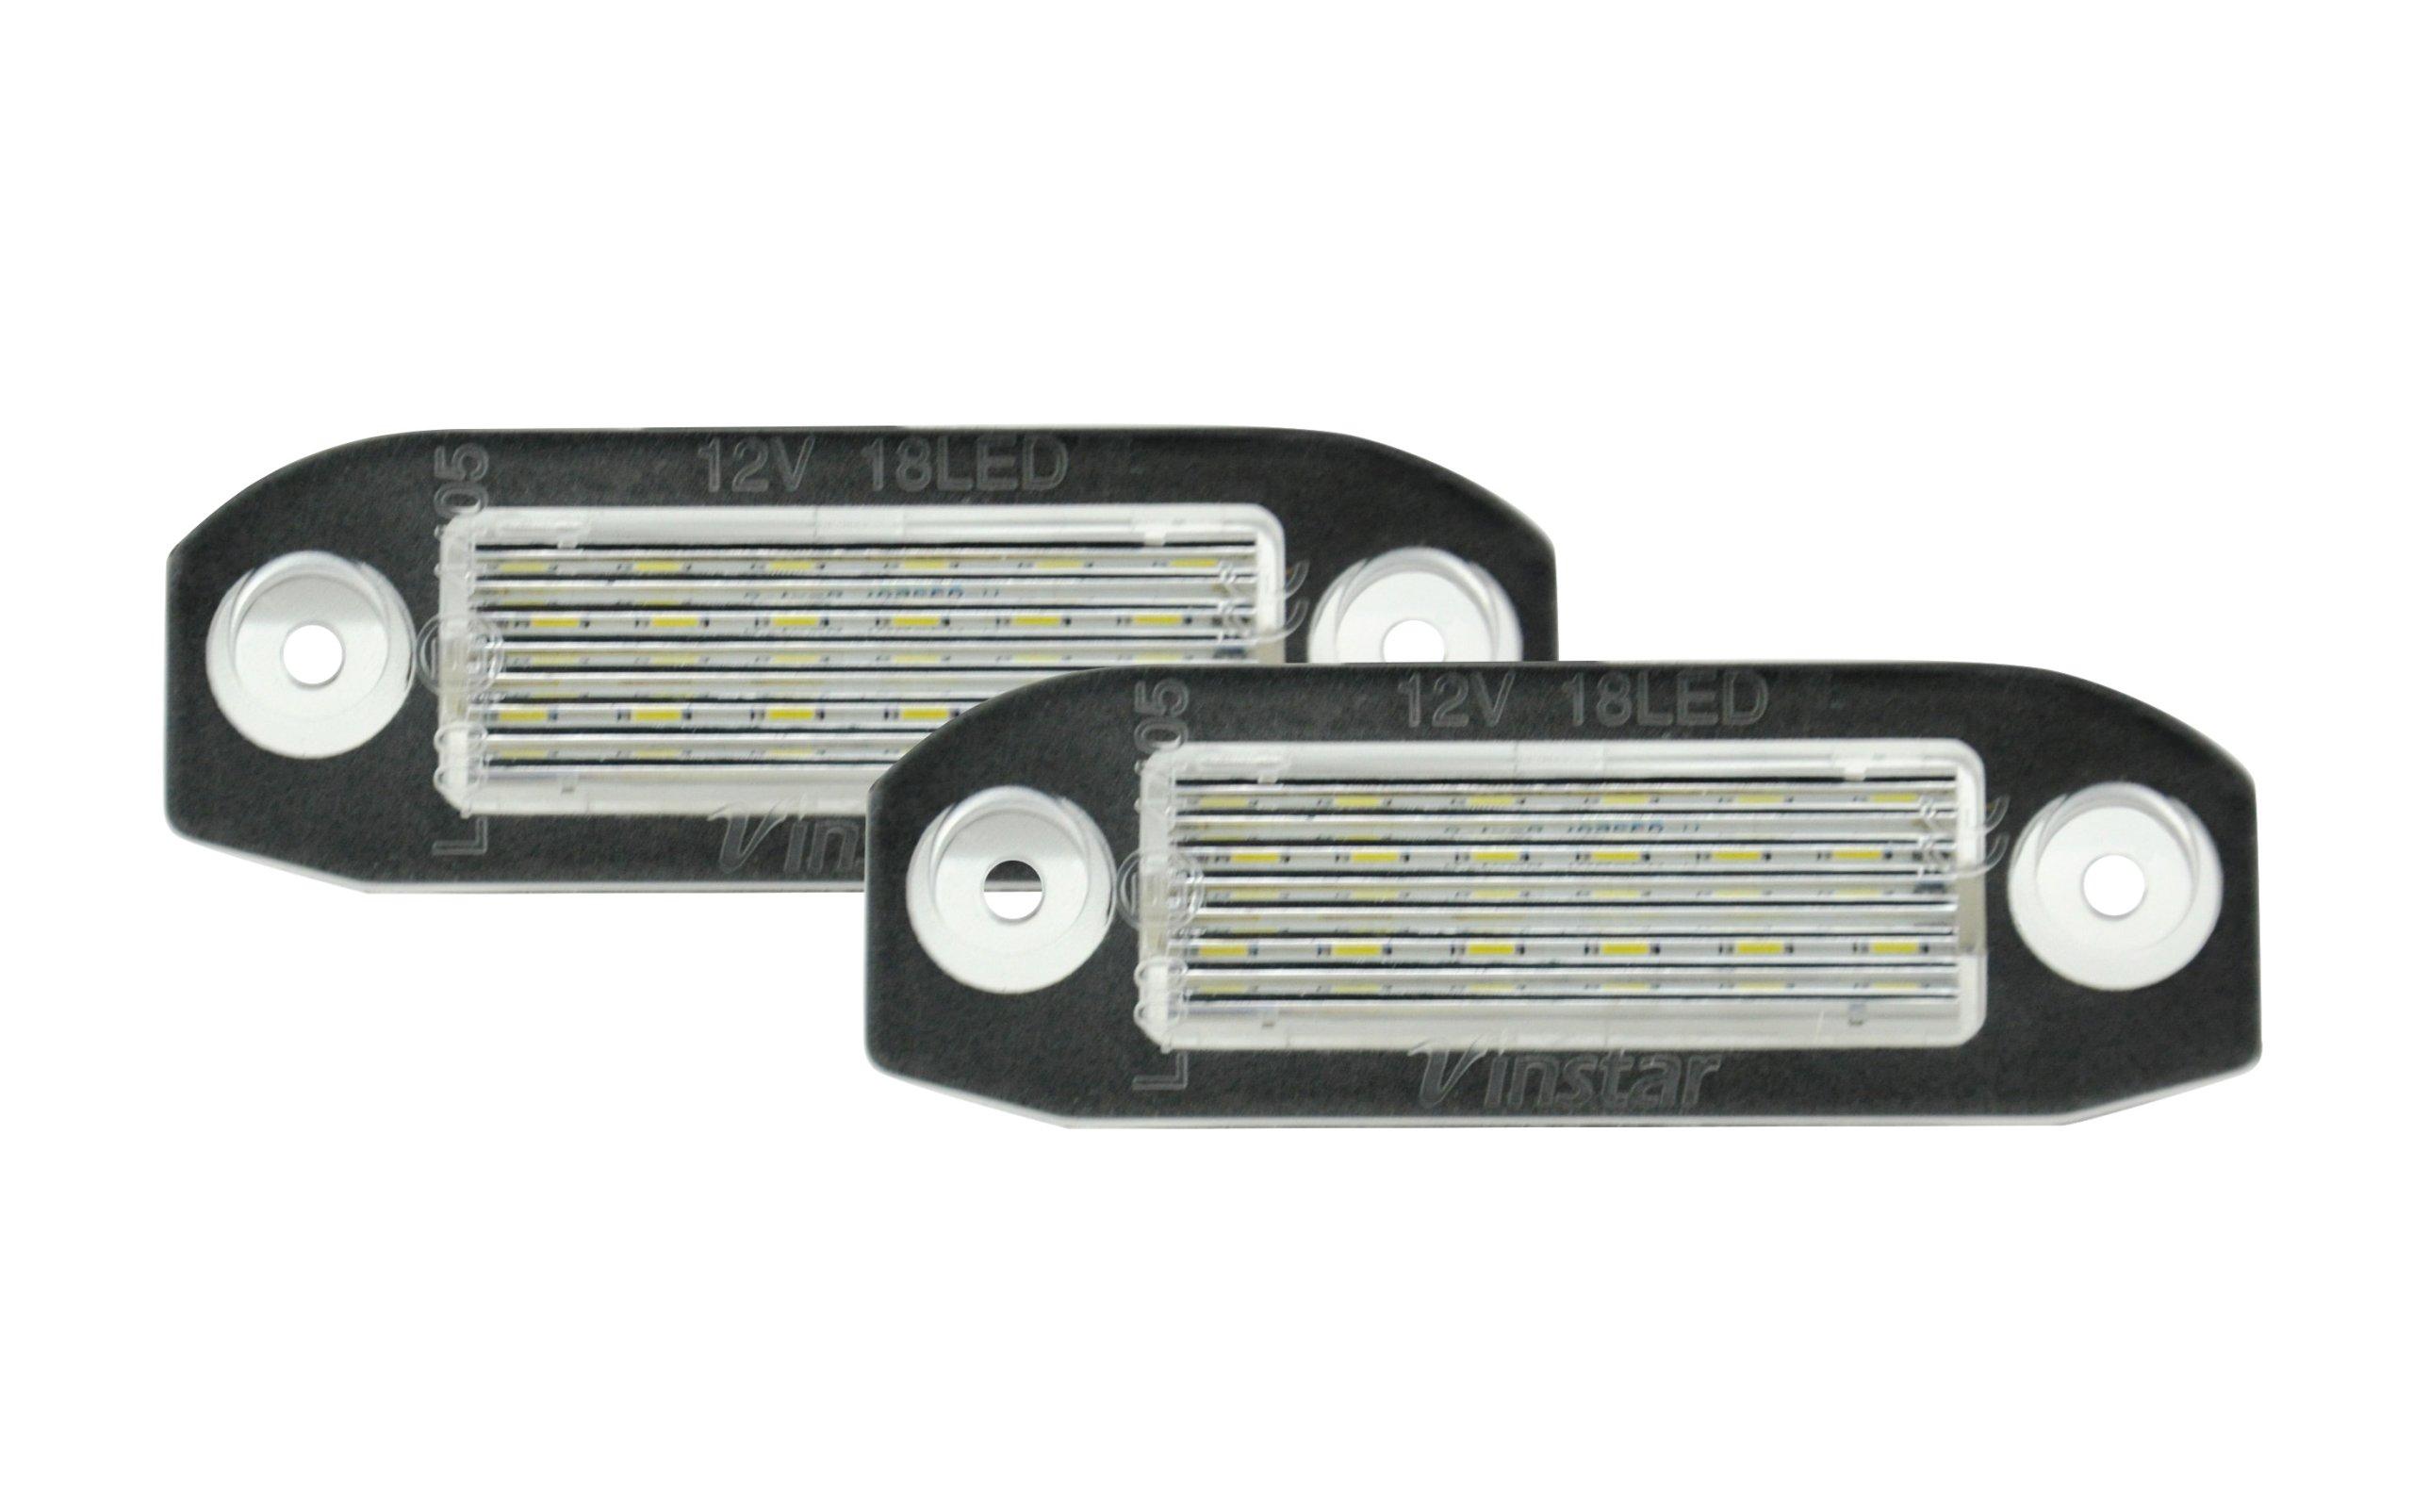 LAMPKA LED VOLVO C30 S40 S60 S80 V70 XC60 XC70